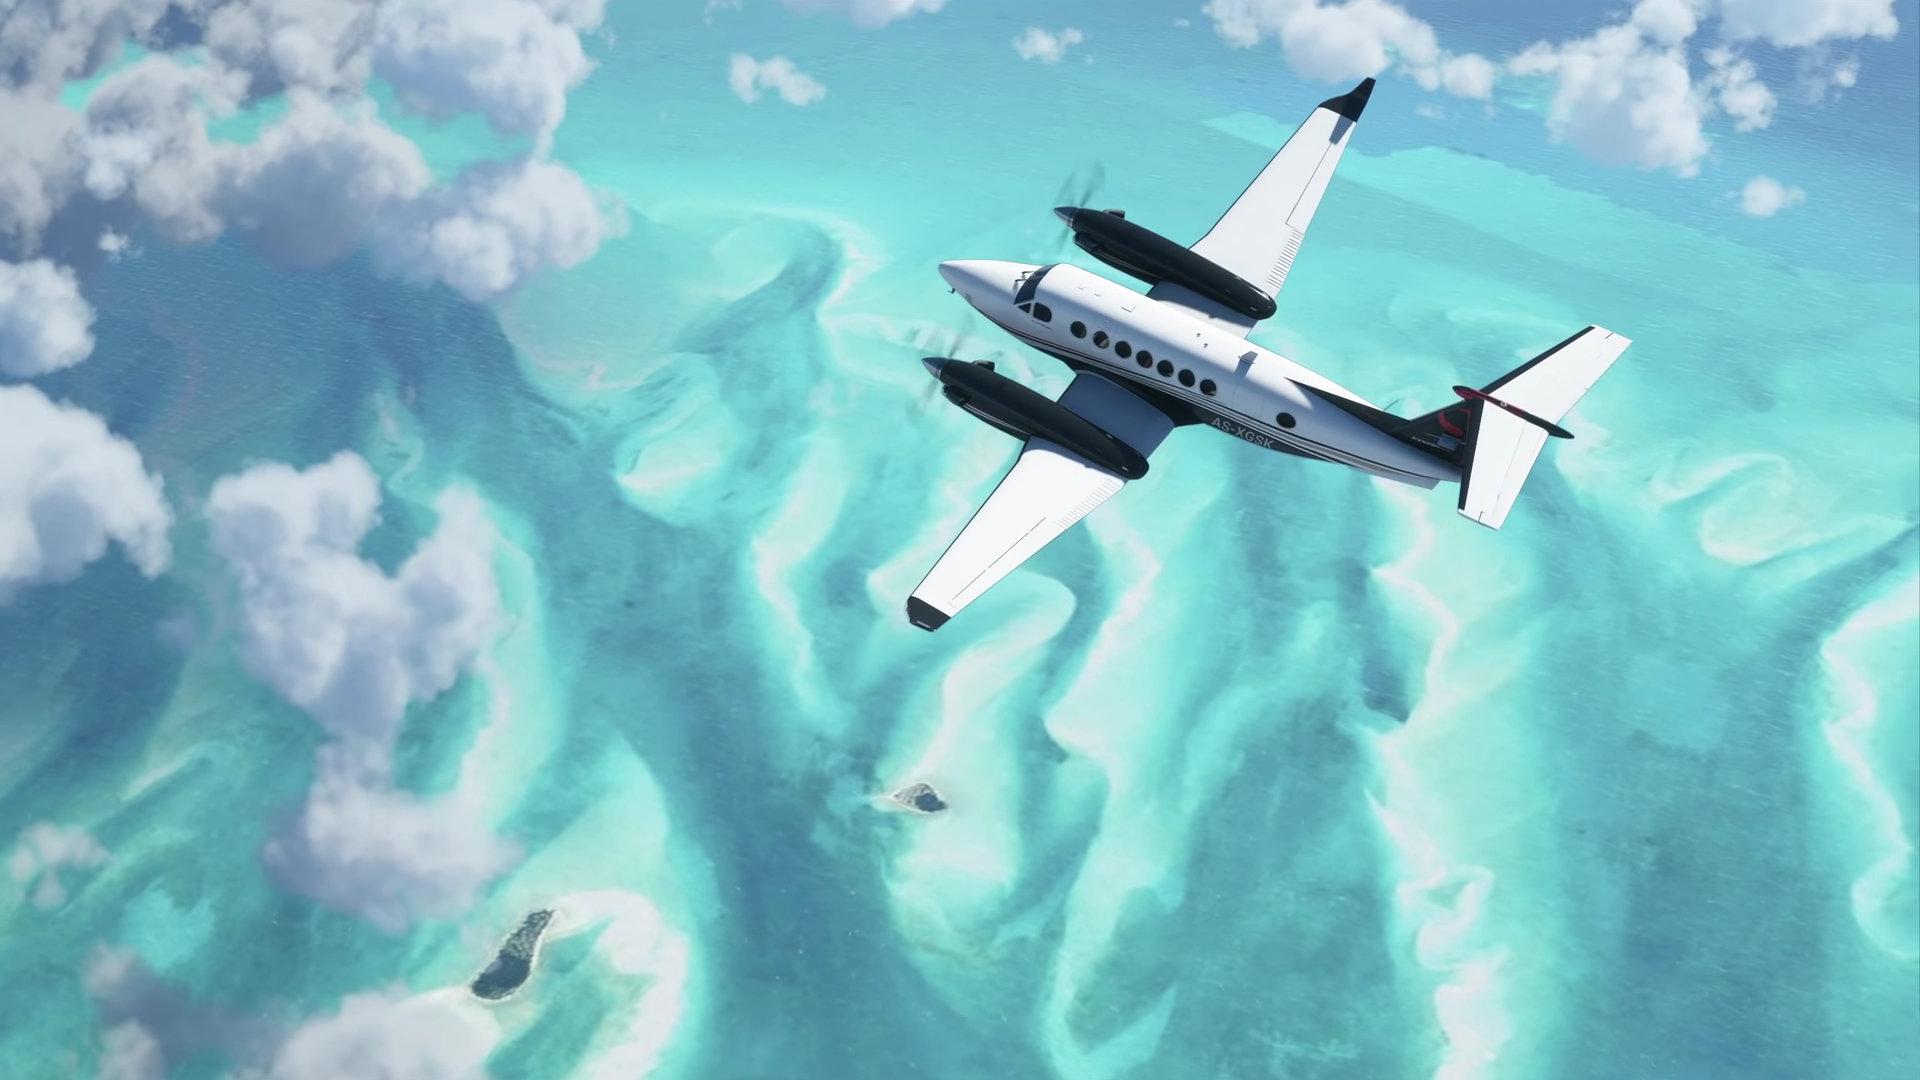 Quelle: Asobo - Microsoft Flight Simulator